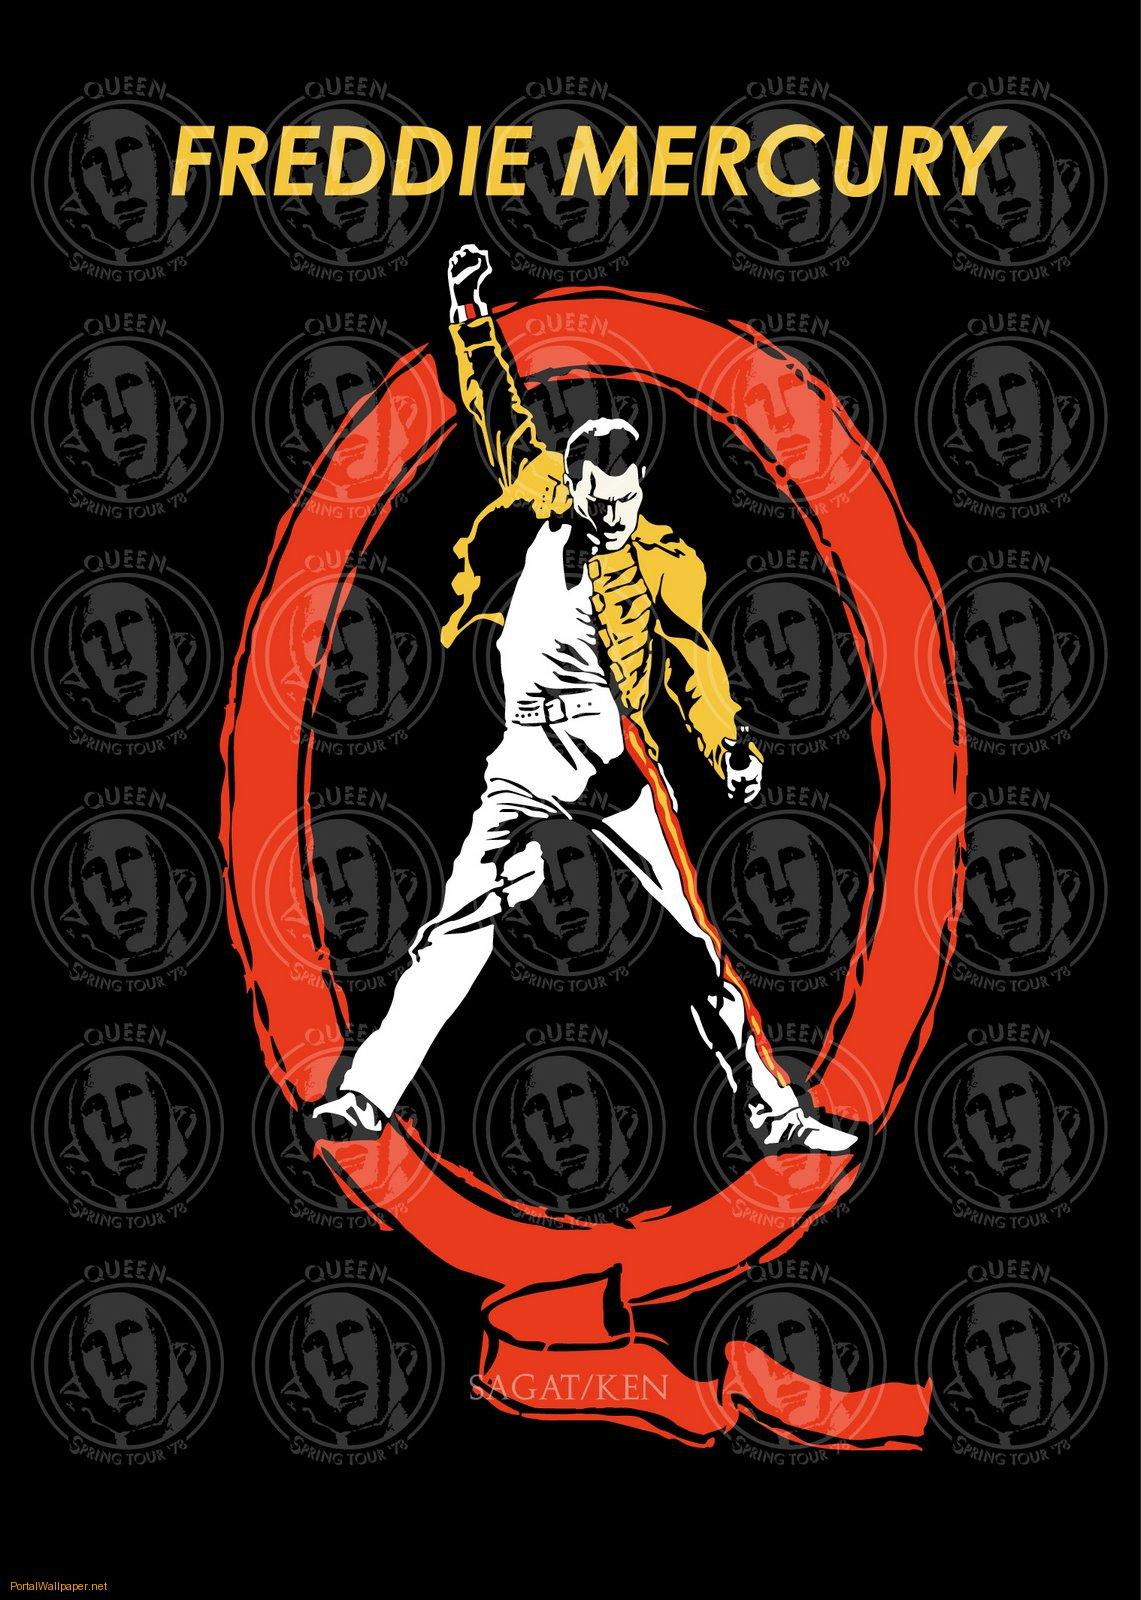 http://2.bp.blogspot.com/-EWh_QGwerkM/TmUPRdyxBaI/AAAAAAAAB5k/kIVTp45LS3Y/s1600/Freddie-Mercury-1.jpg